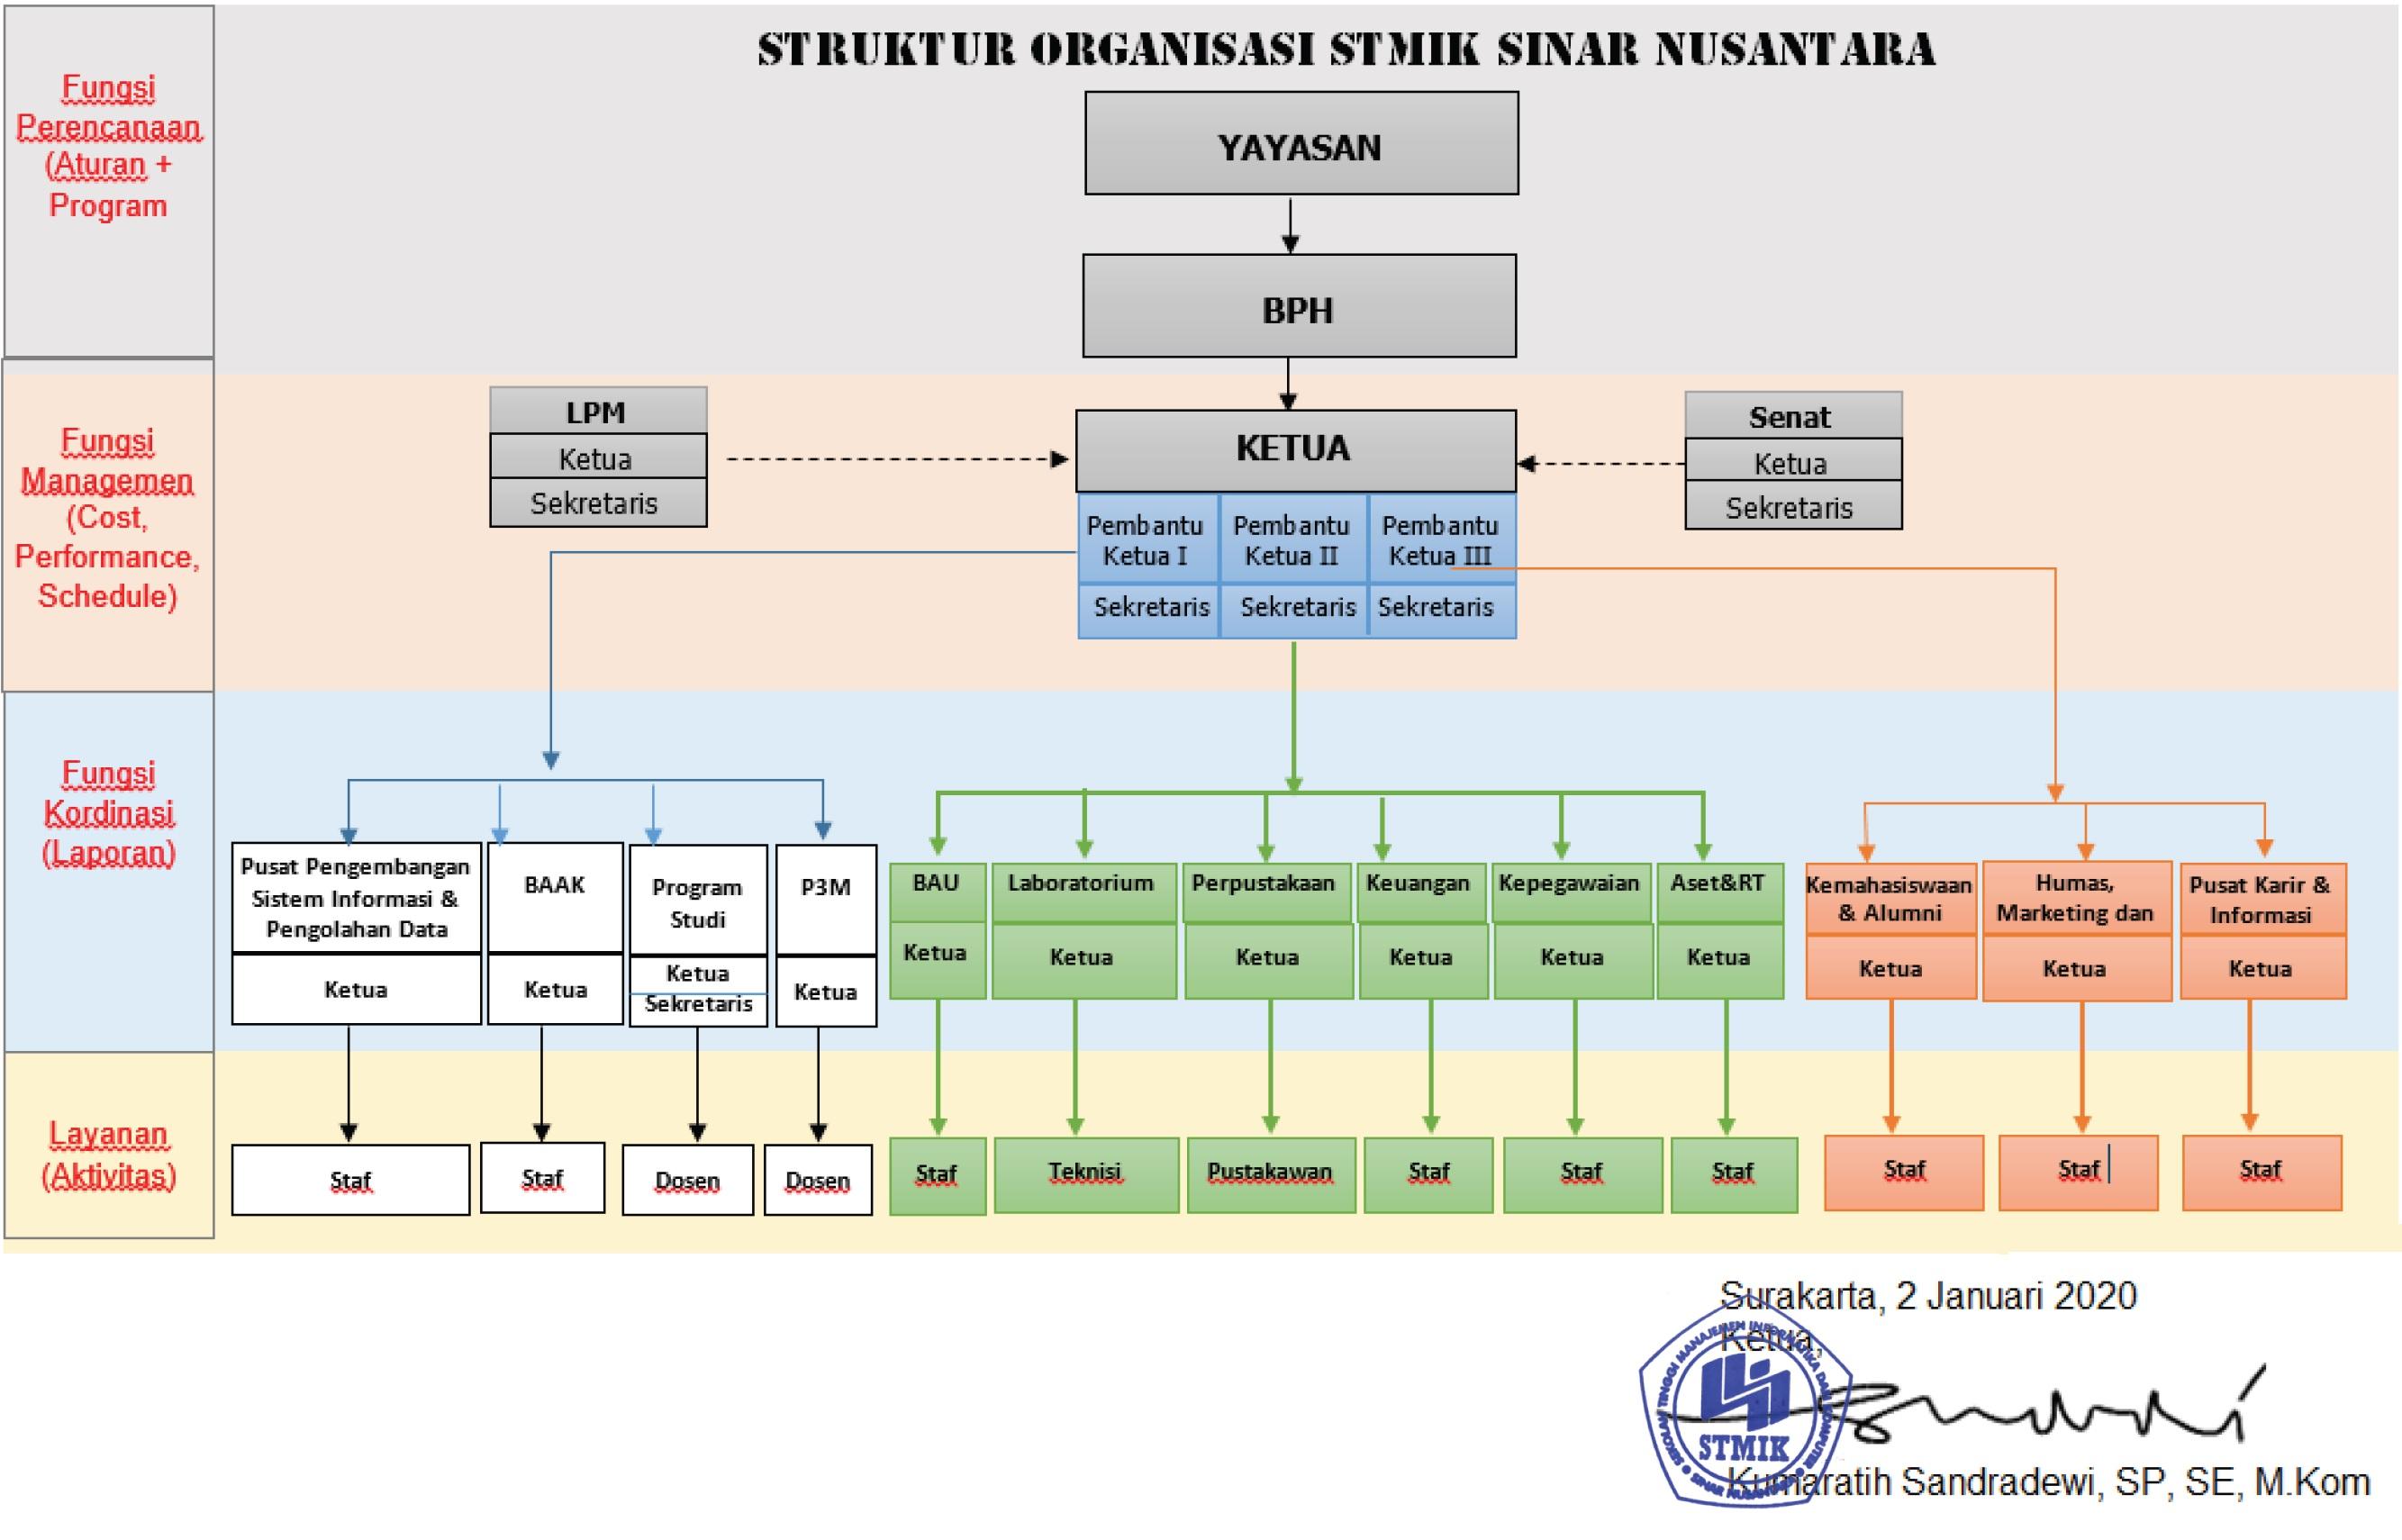 Struktur Organisasi STMIK Sinus